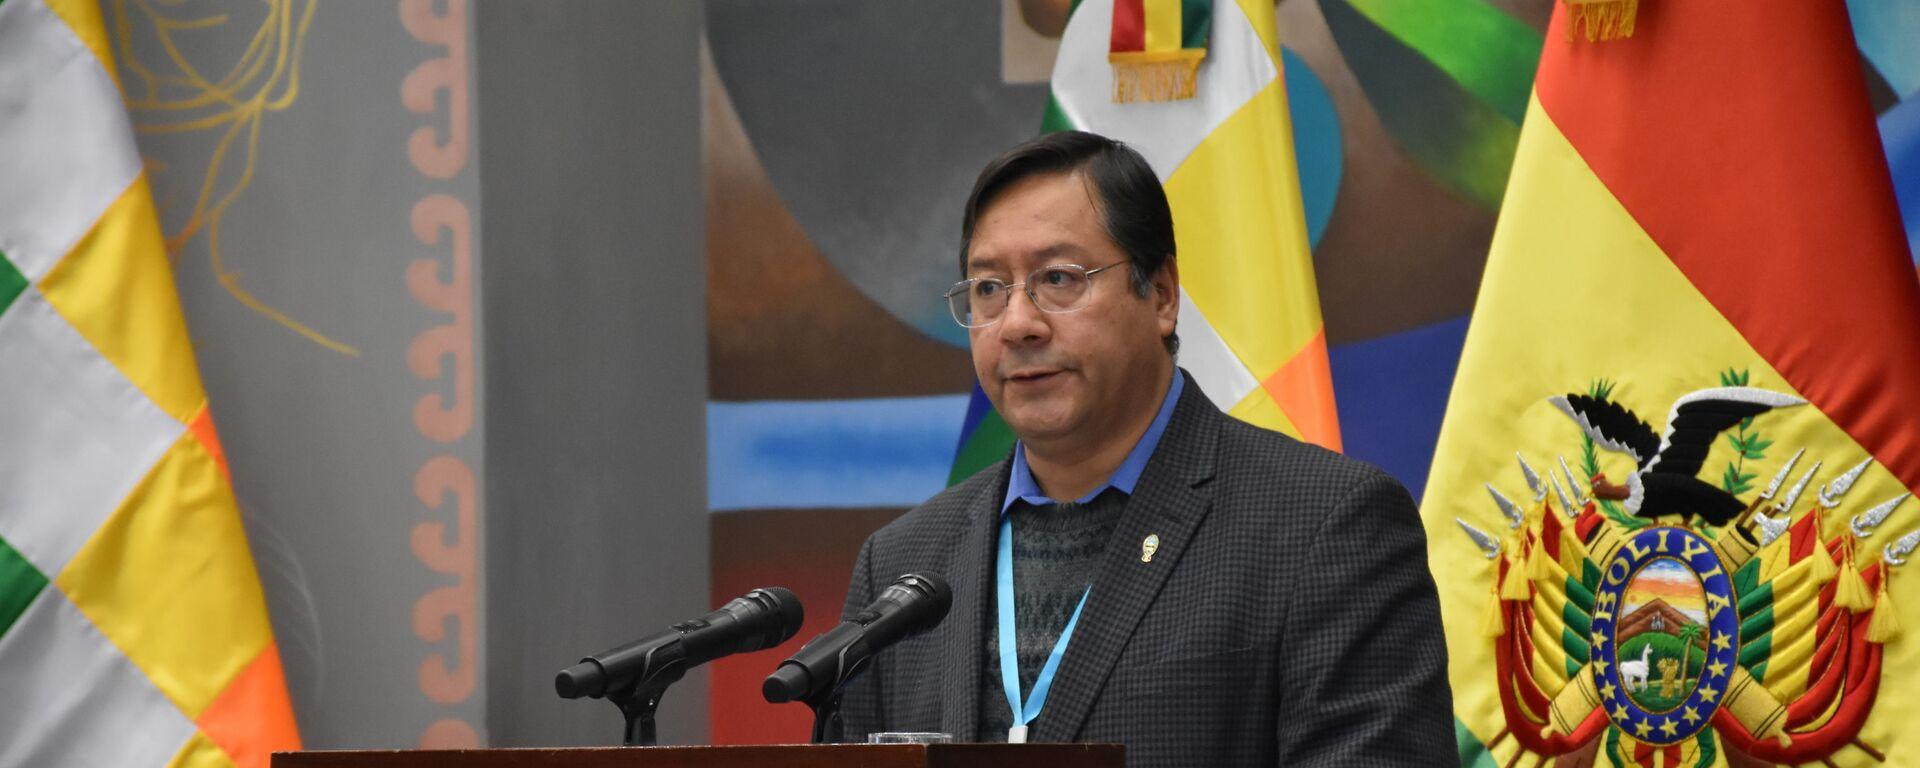 Luis Arce, el presidente de Bolivia - Sputnik Mundo, 1920, 17.08.2021